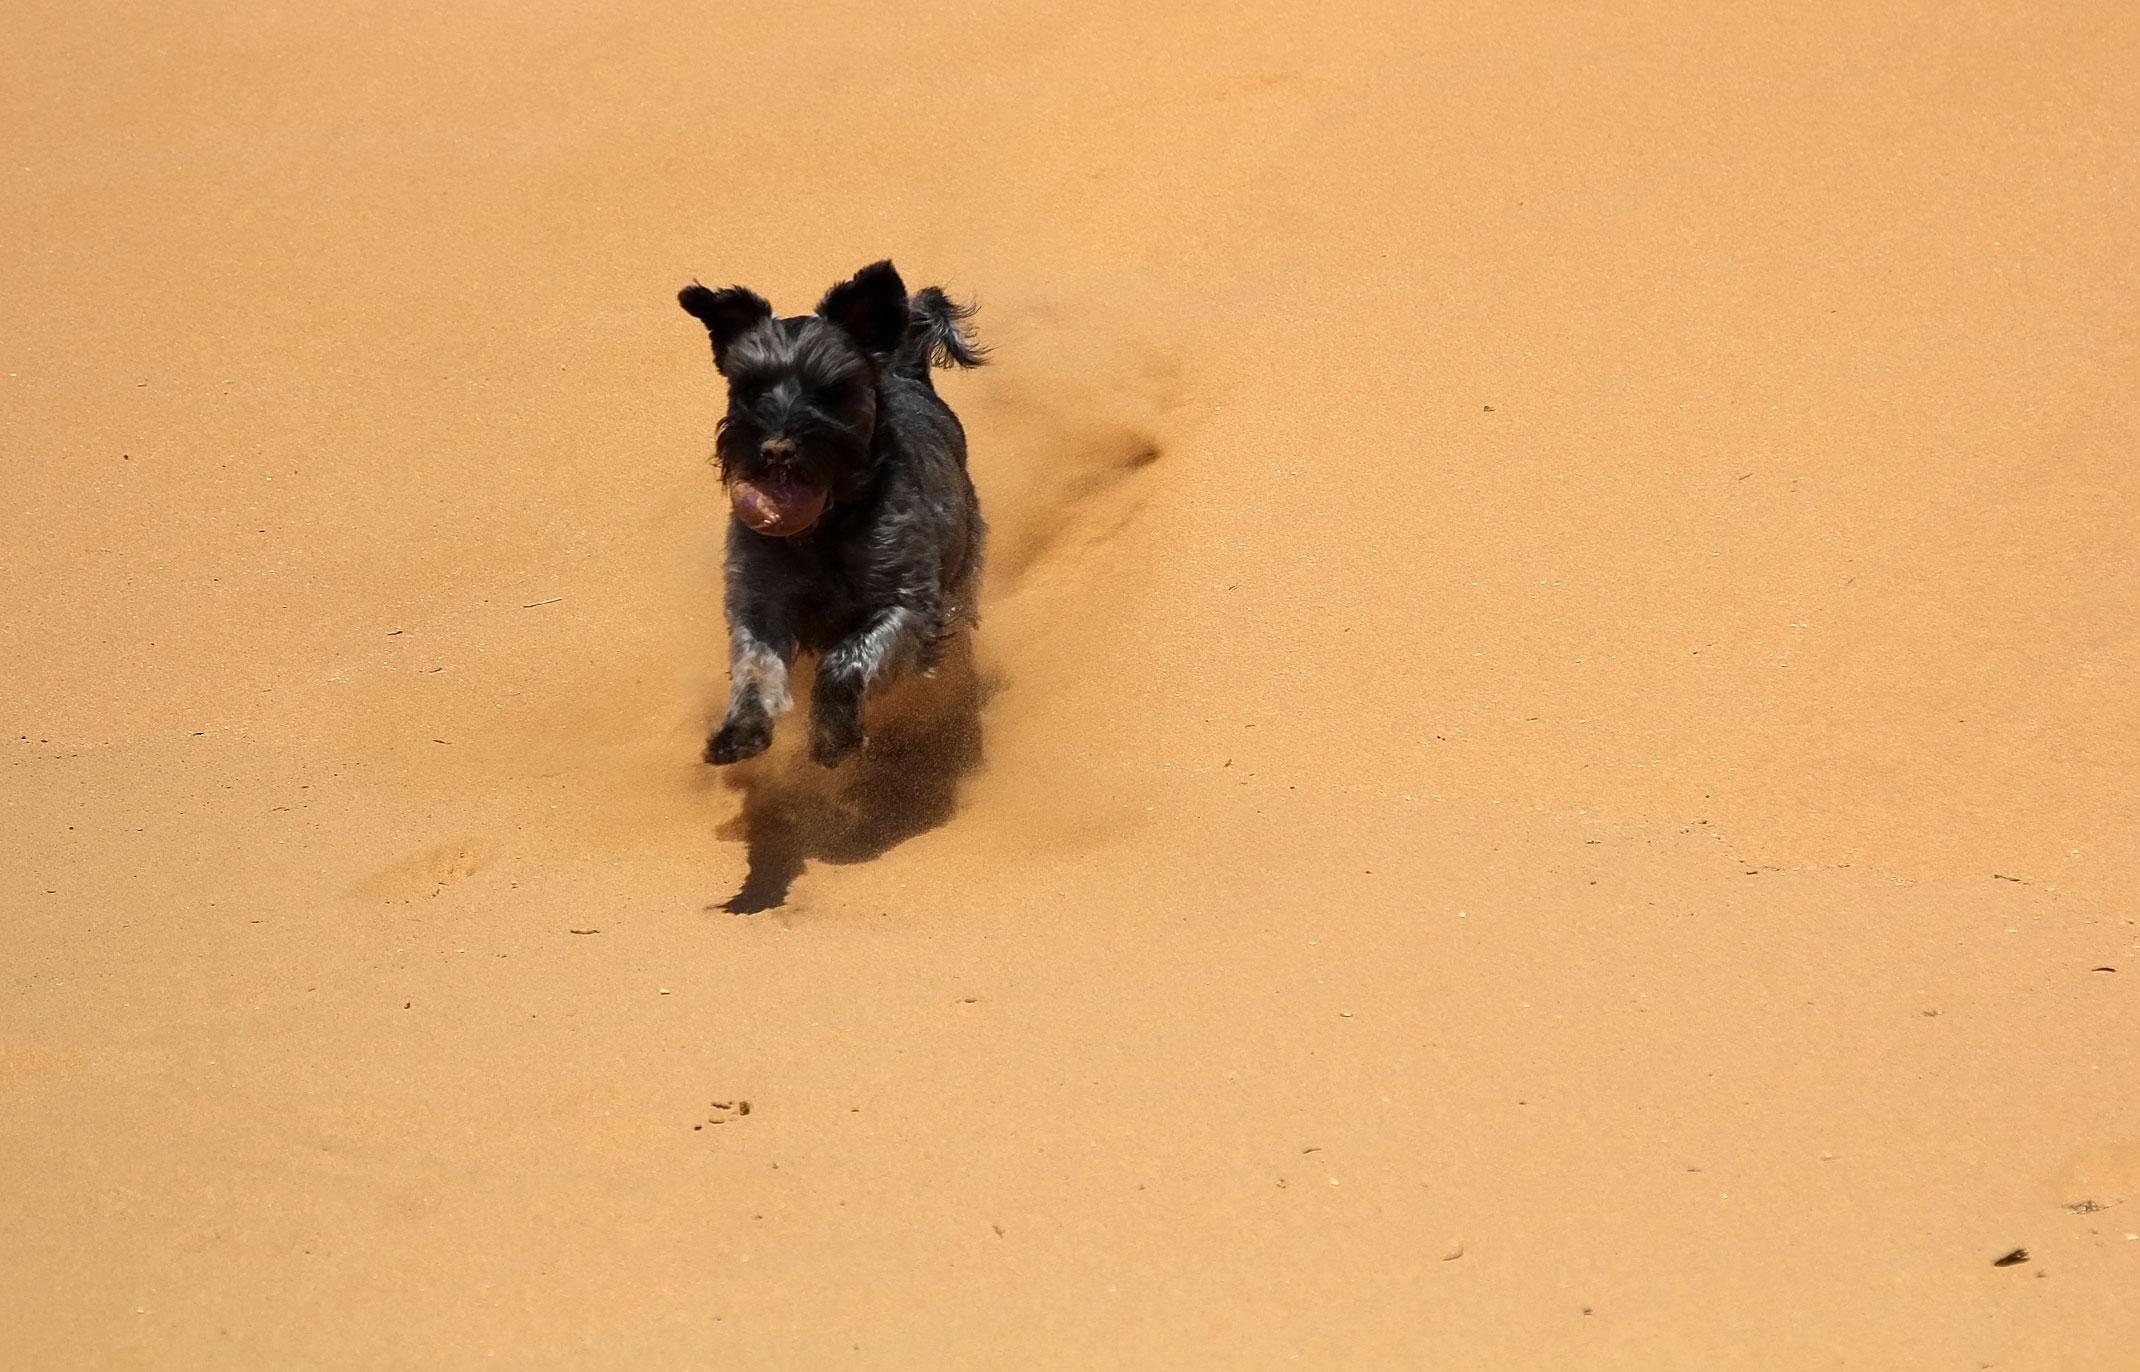 Pies na pustyni